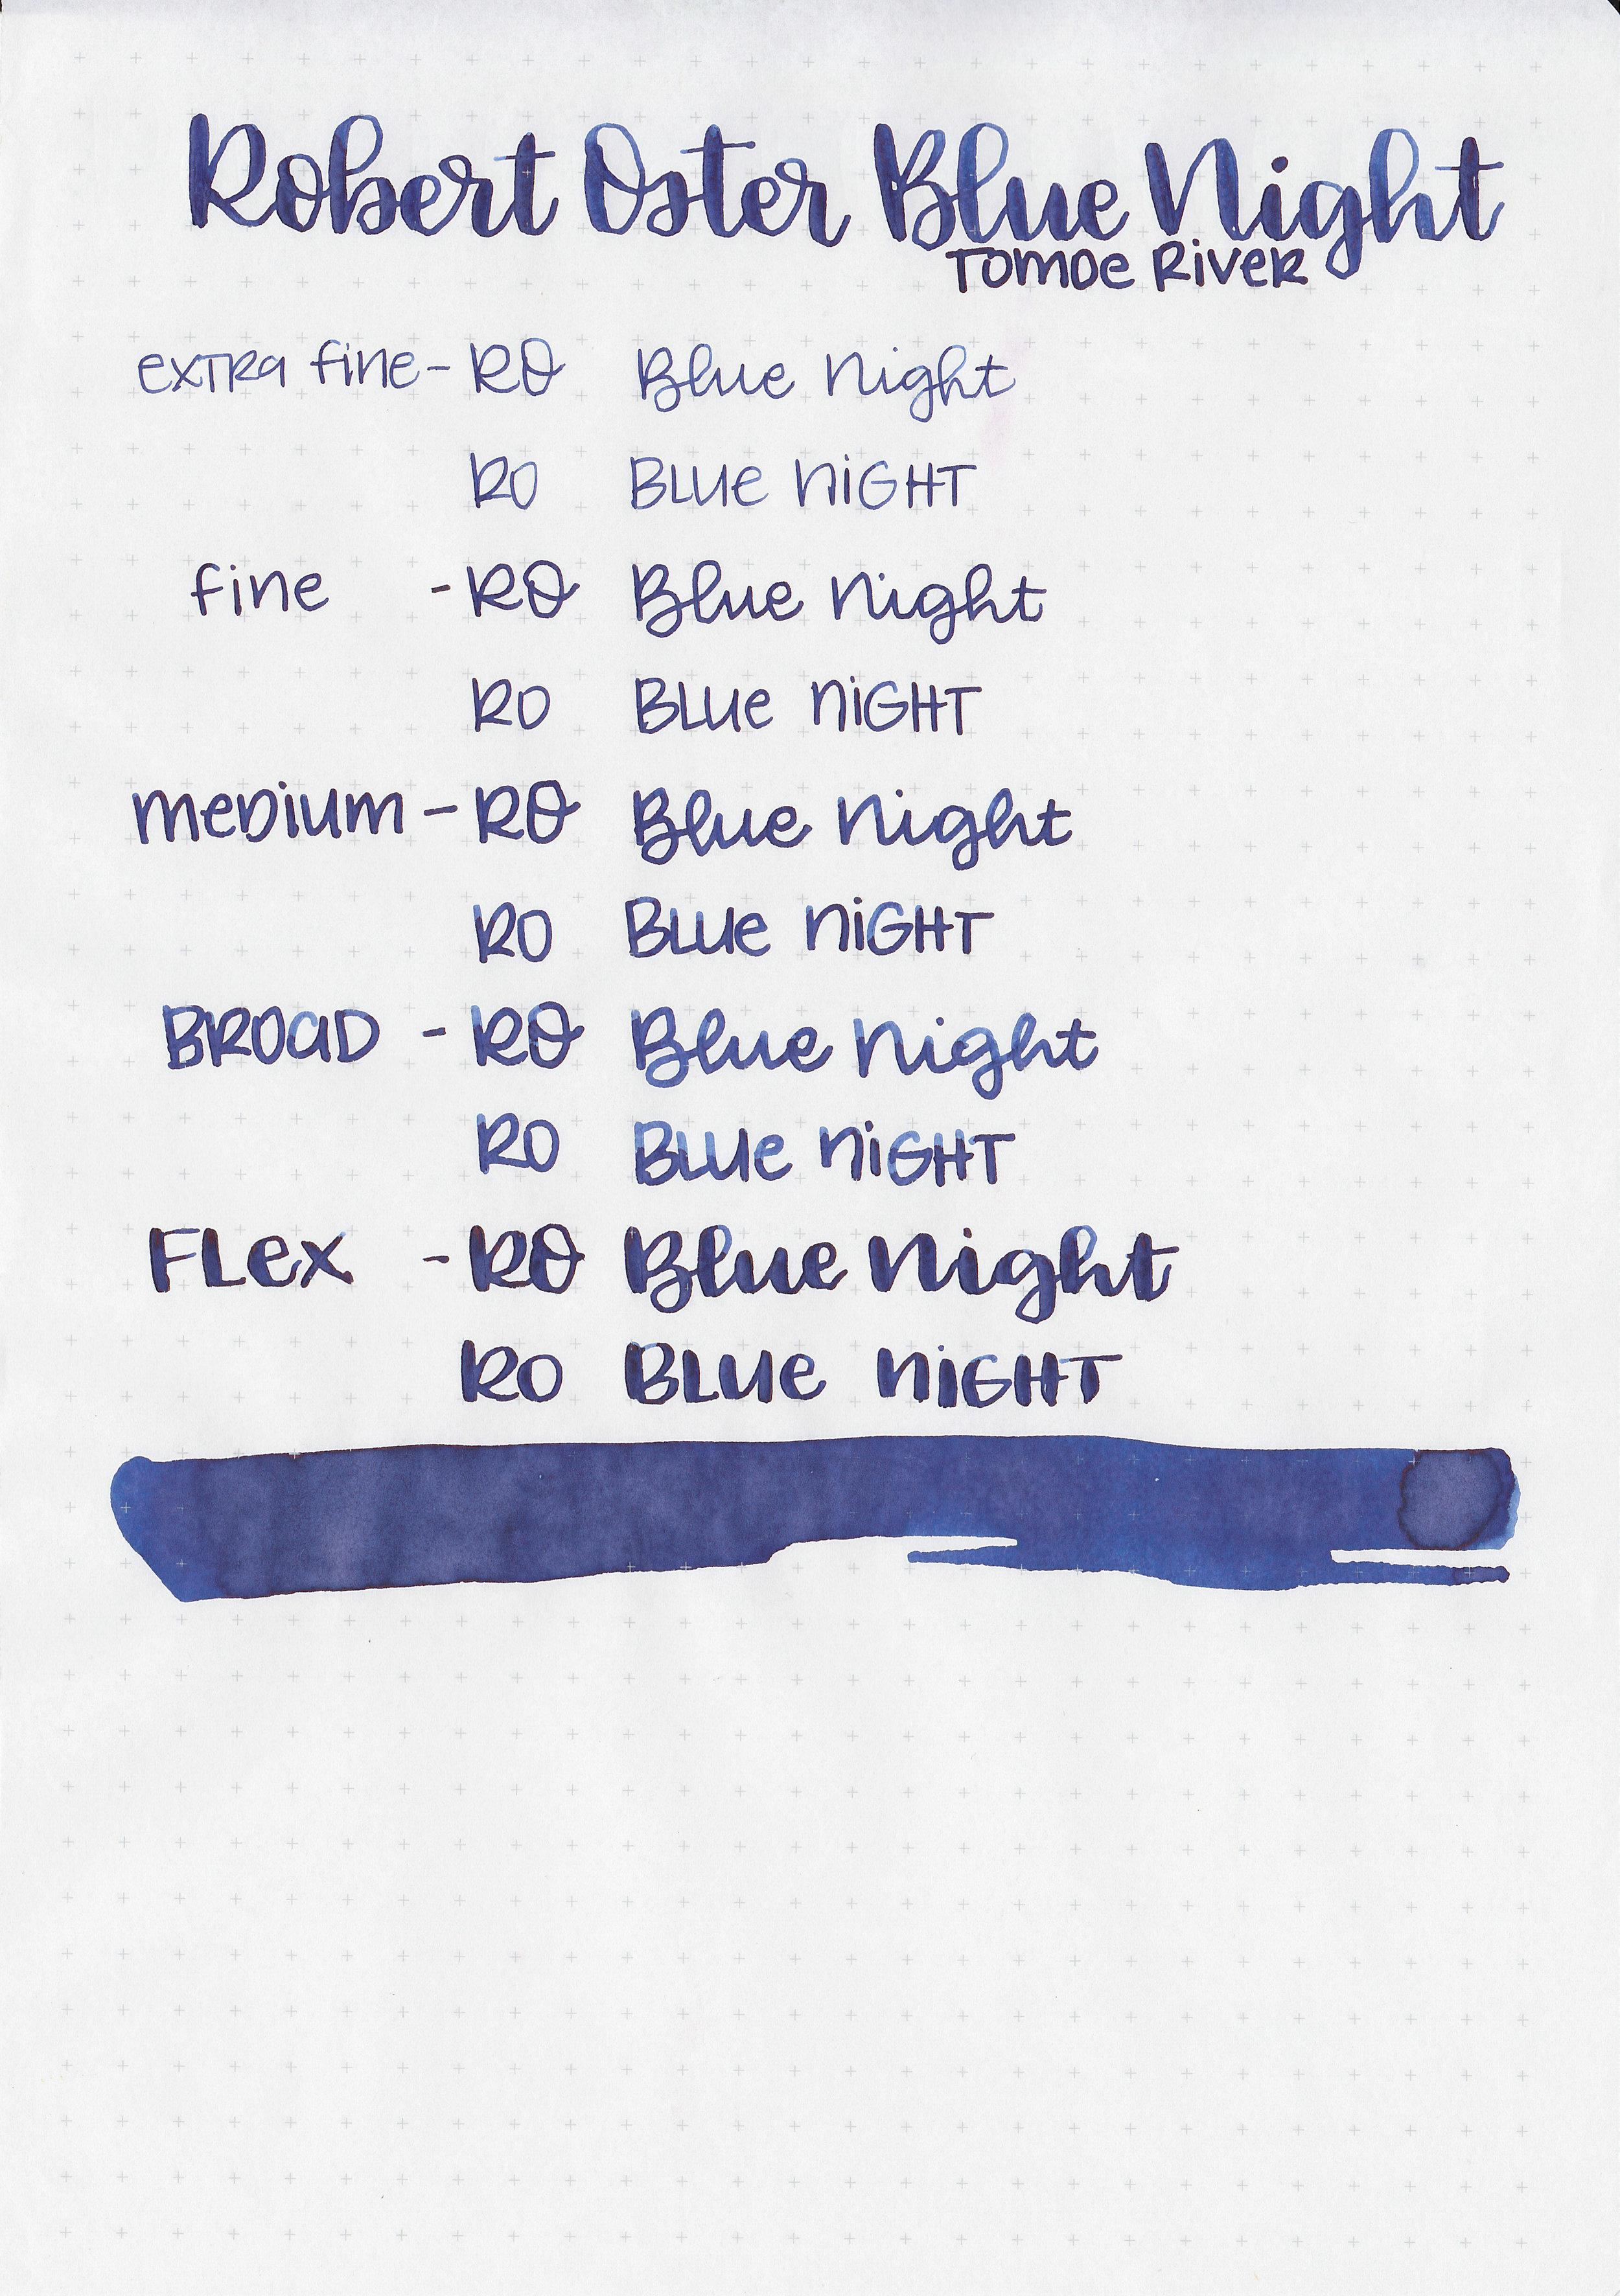 ro-blue-night-8.jpg